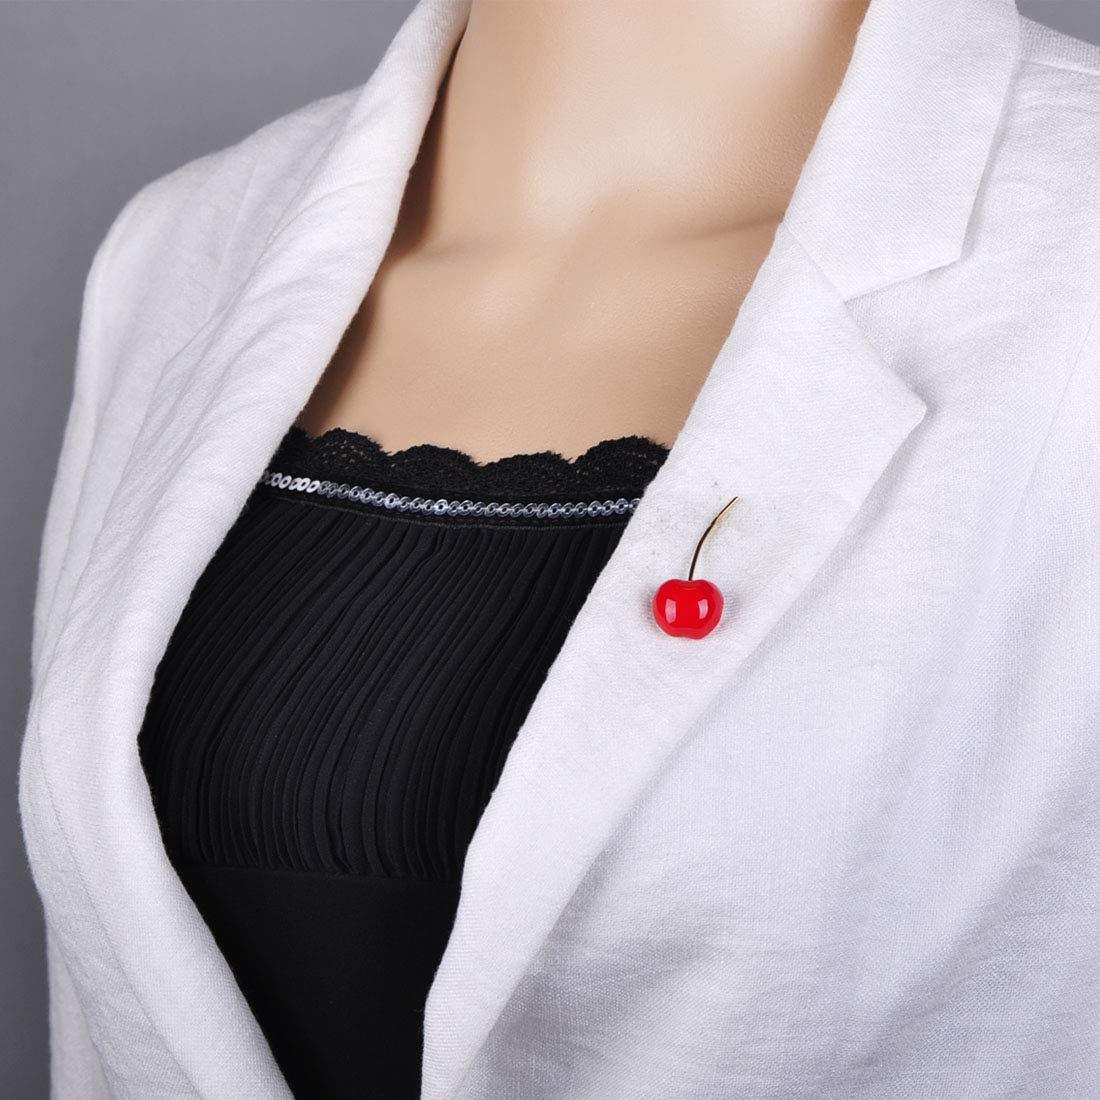 MECHOSE Lovely Red Cherry Shape Brooch Pins for Women Kid Cute Small Enamel Fruit Sweater Shirt Bag by MECHOSEN (Image #2)